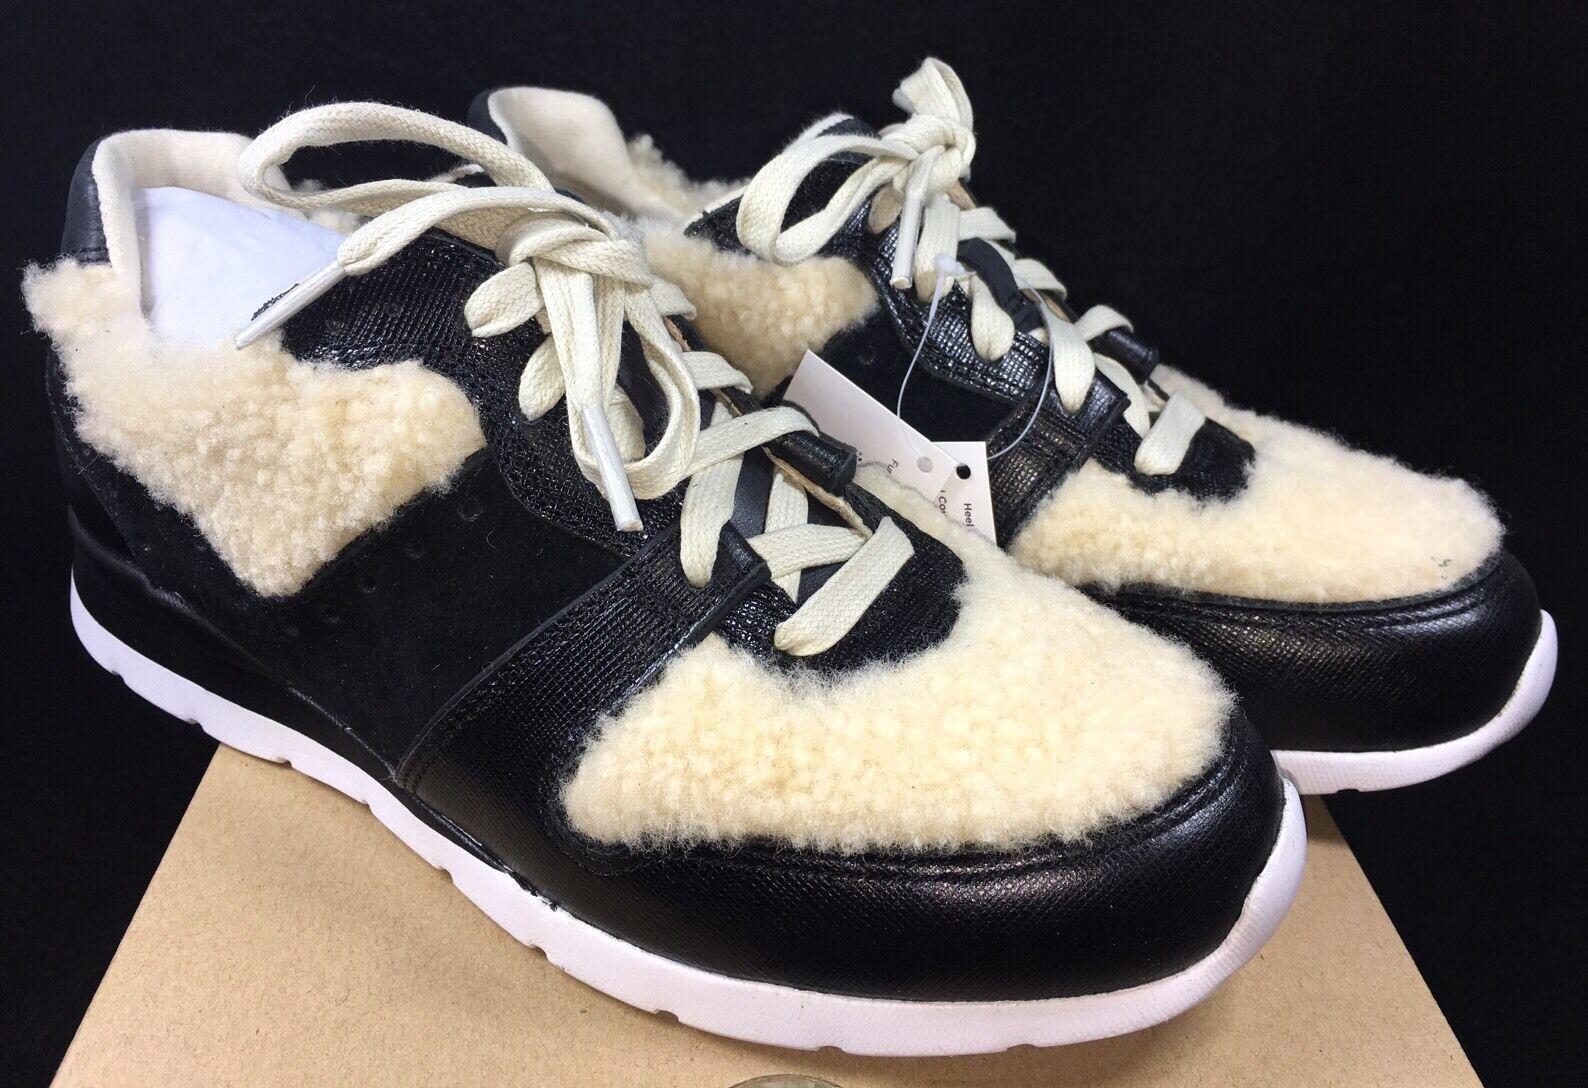 UGG Deaven Lammfell Sneaker Athletic Fashion Schuhe 1014480 Schwarz Tan Shearling